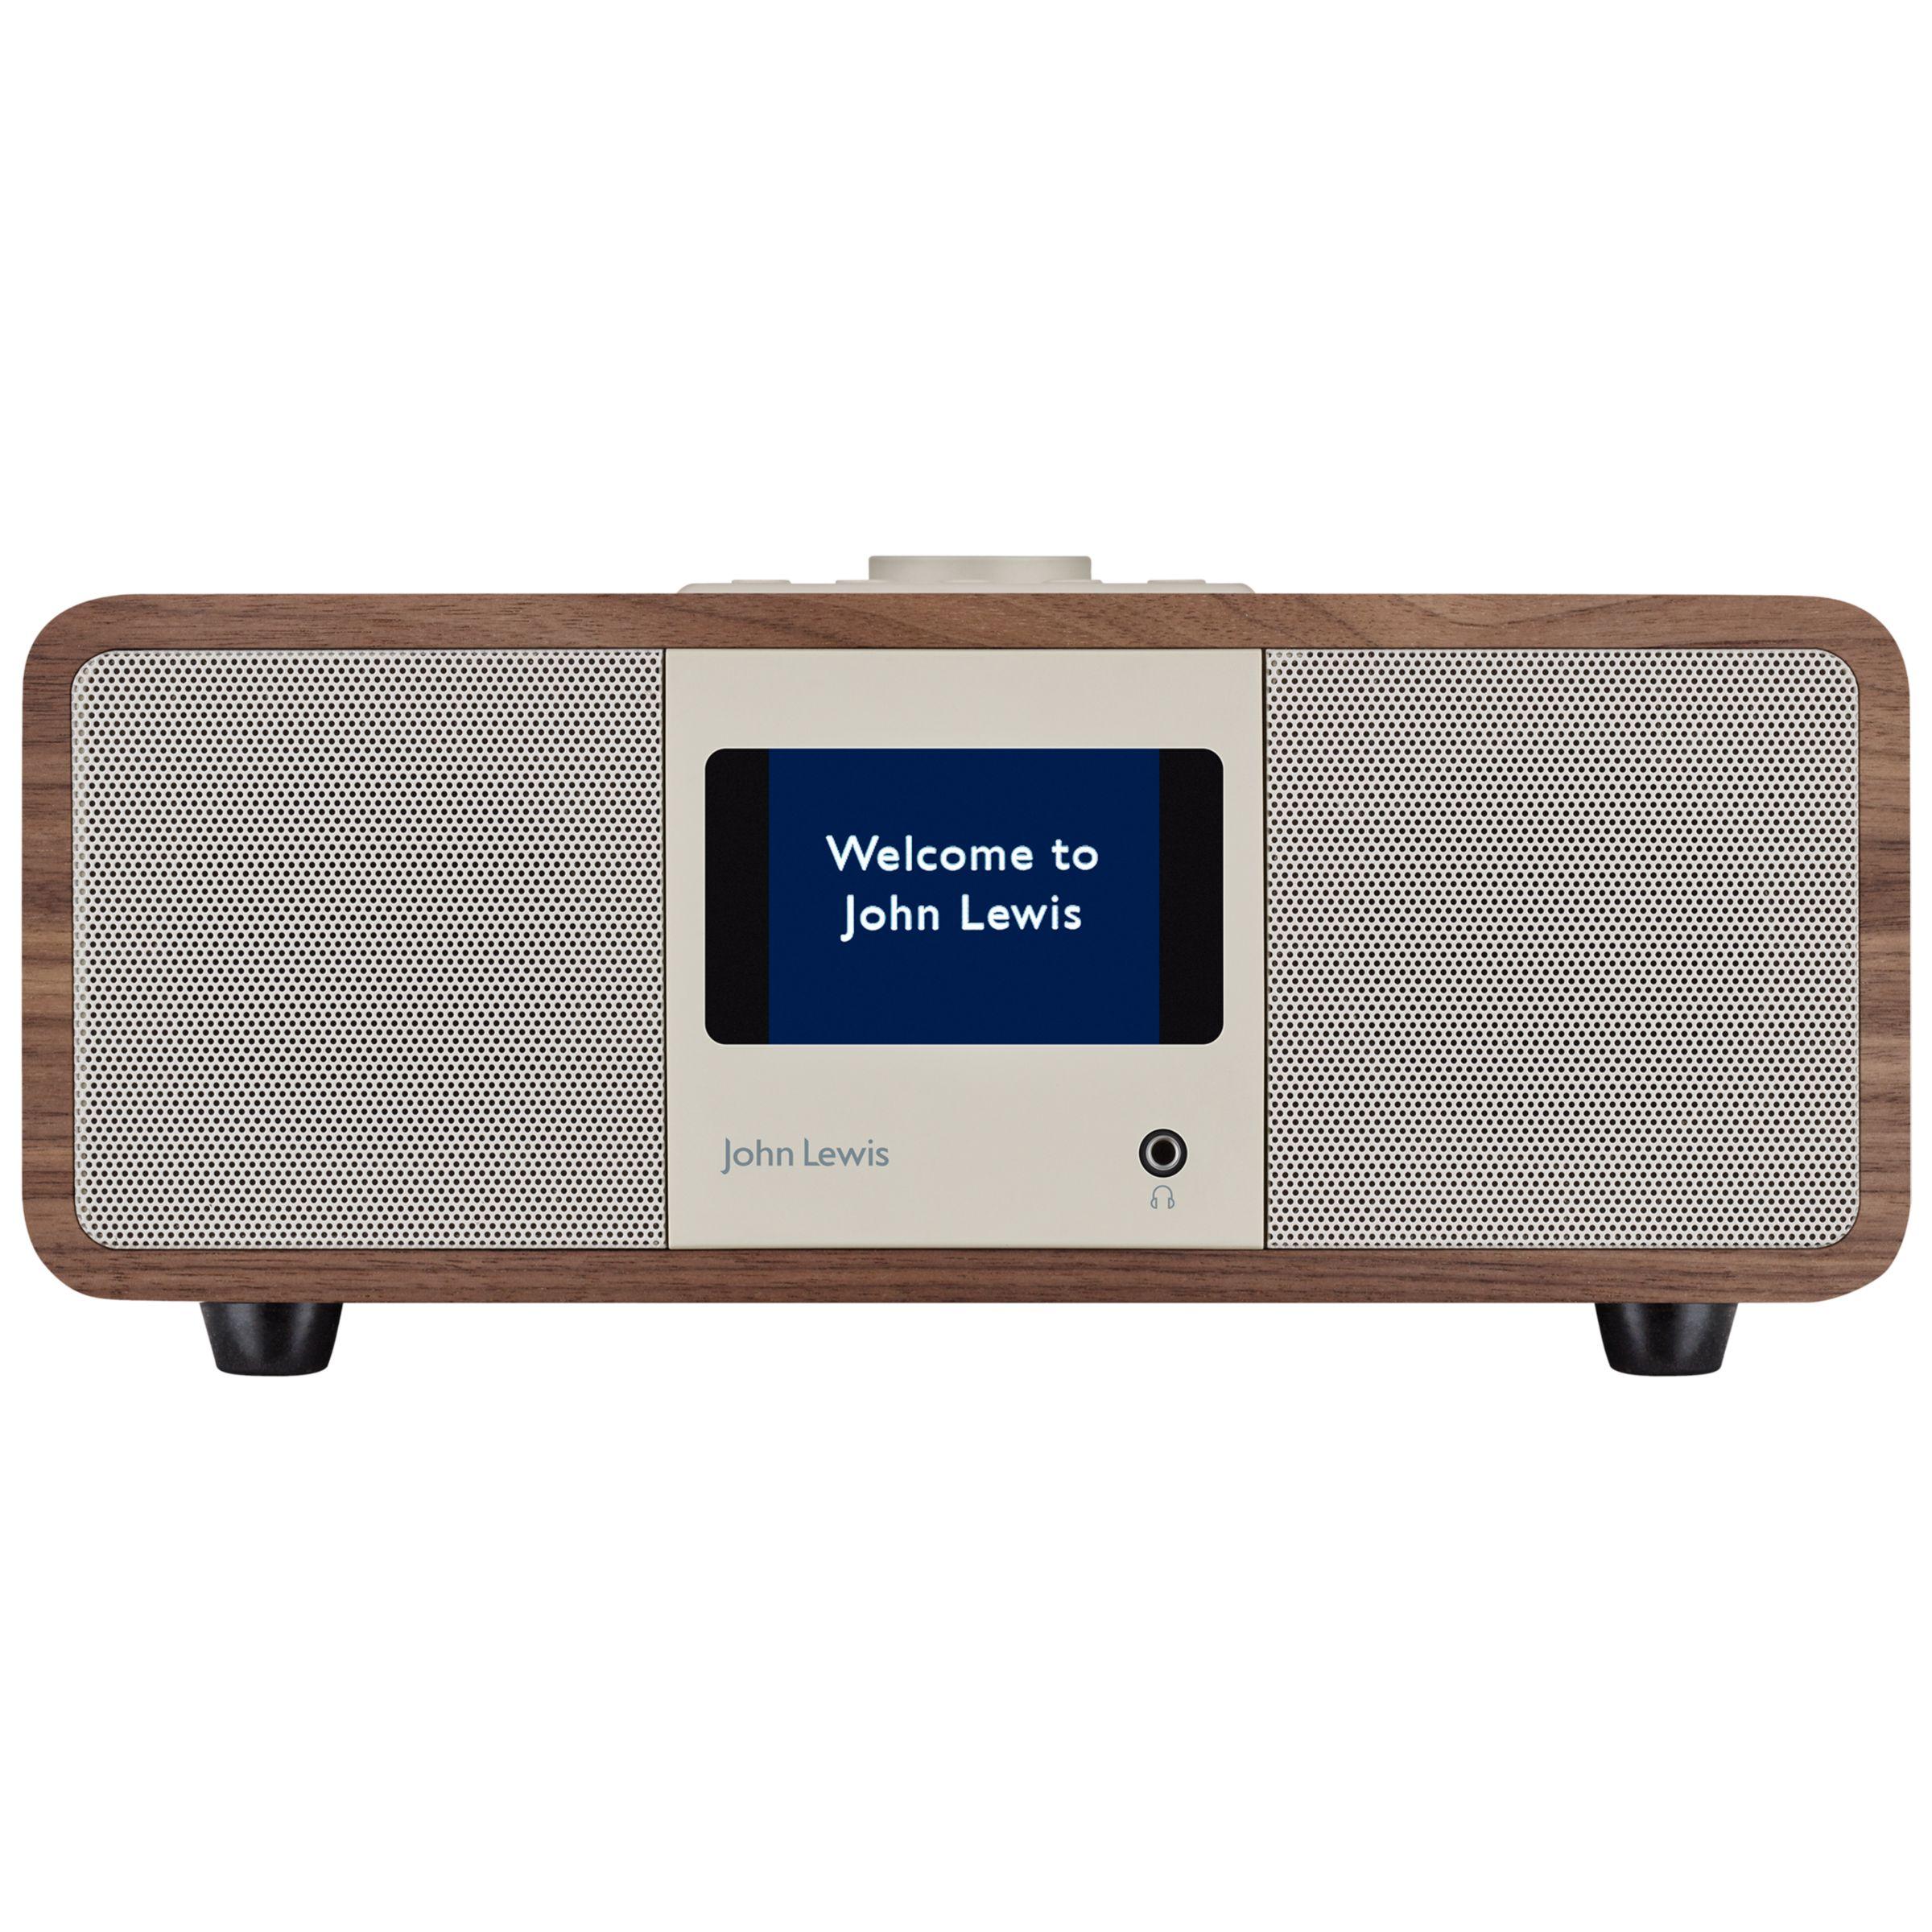 Octave DAB/DAB+/FM/Internet Radio with Wireless Connectivity, Walnut